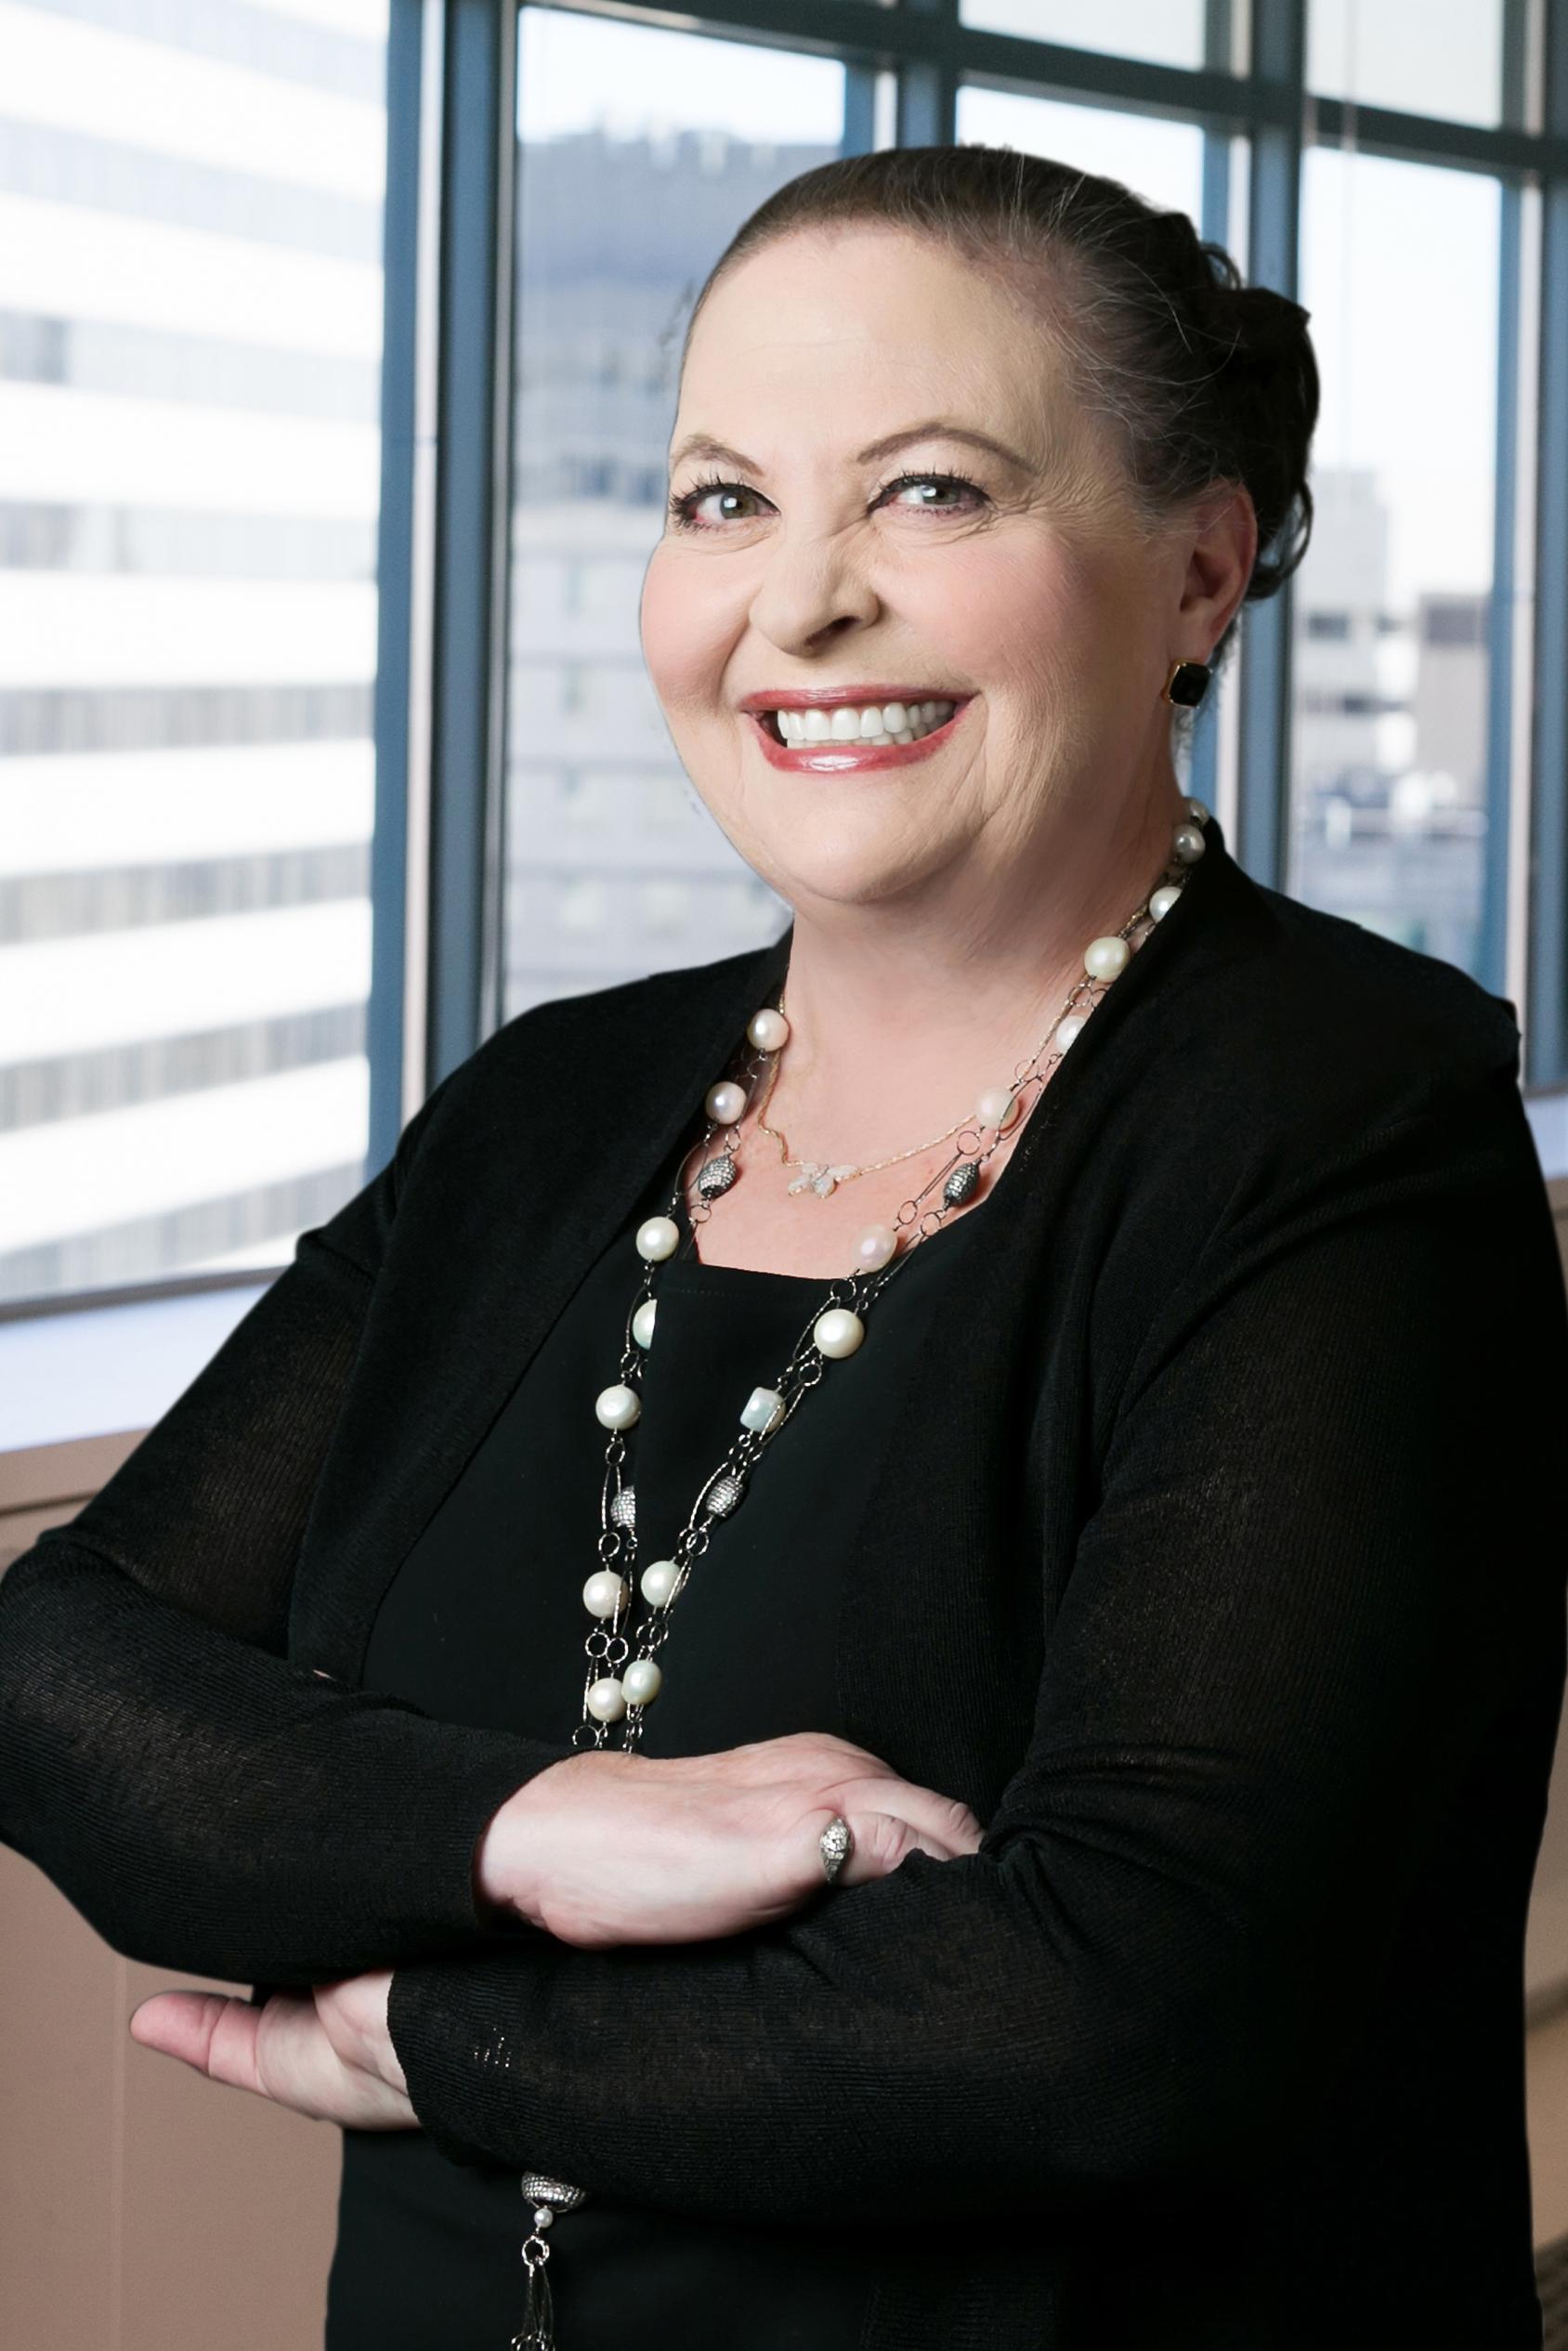 Cheryl Hepfer Headshot 1